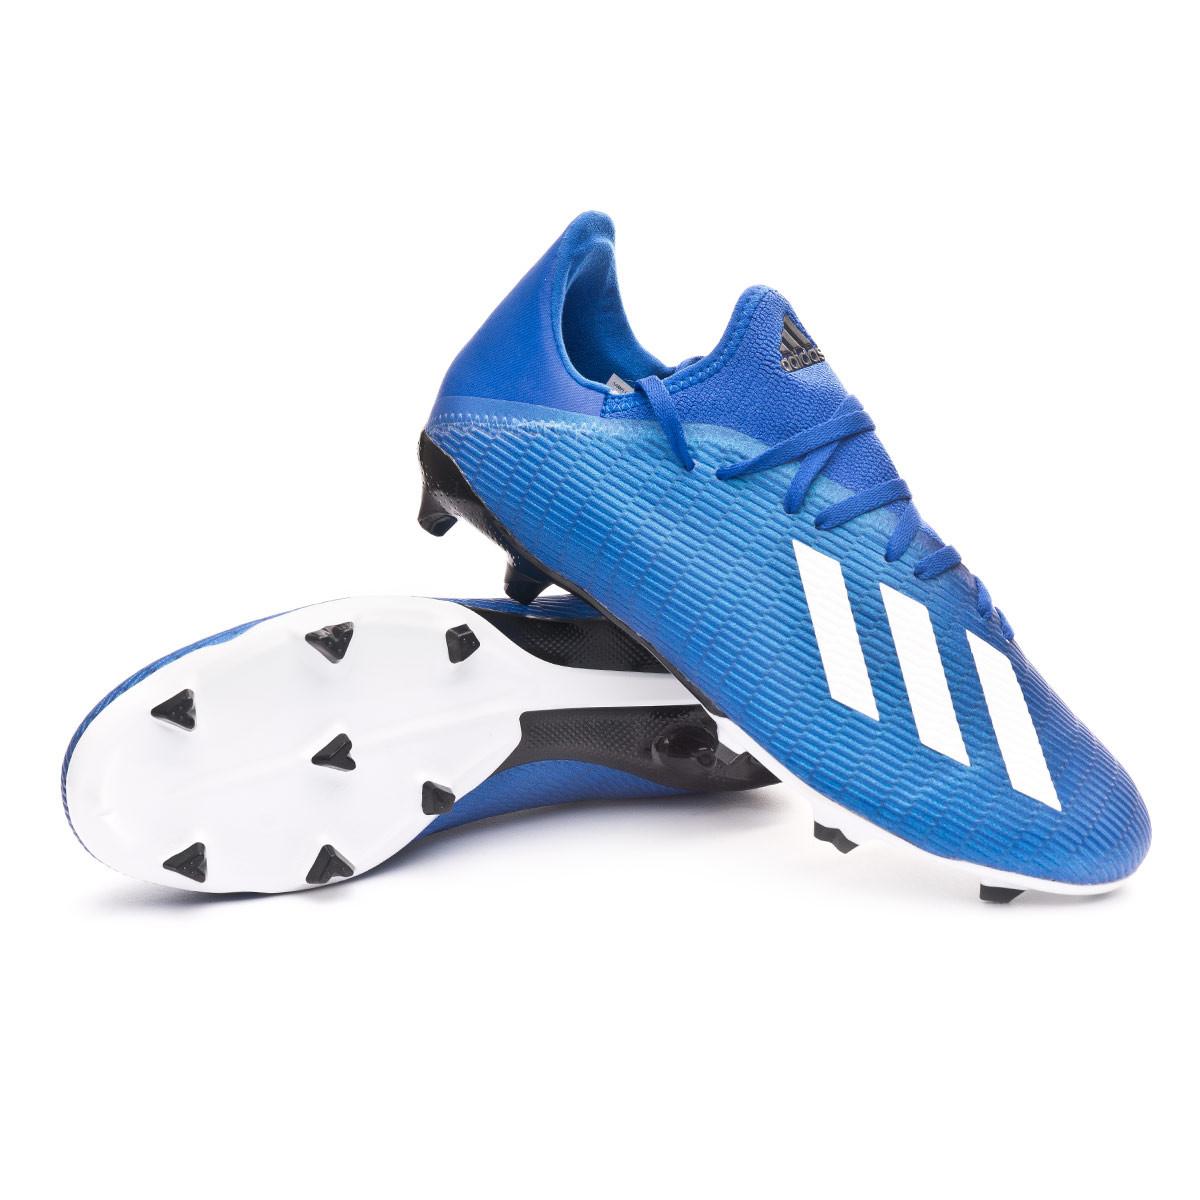 firma Allí Mucho  Football Boots adidas X 19.3 FG Team royal blue-White-Black - Football  store Fútbol Emotion